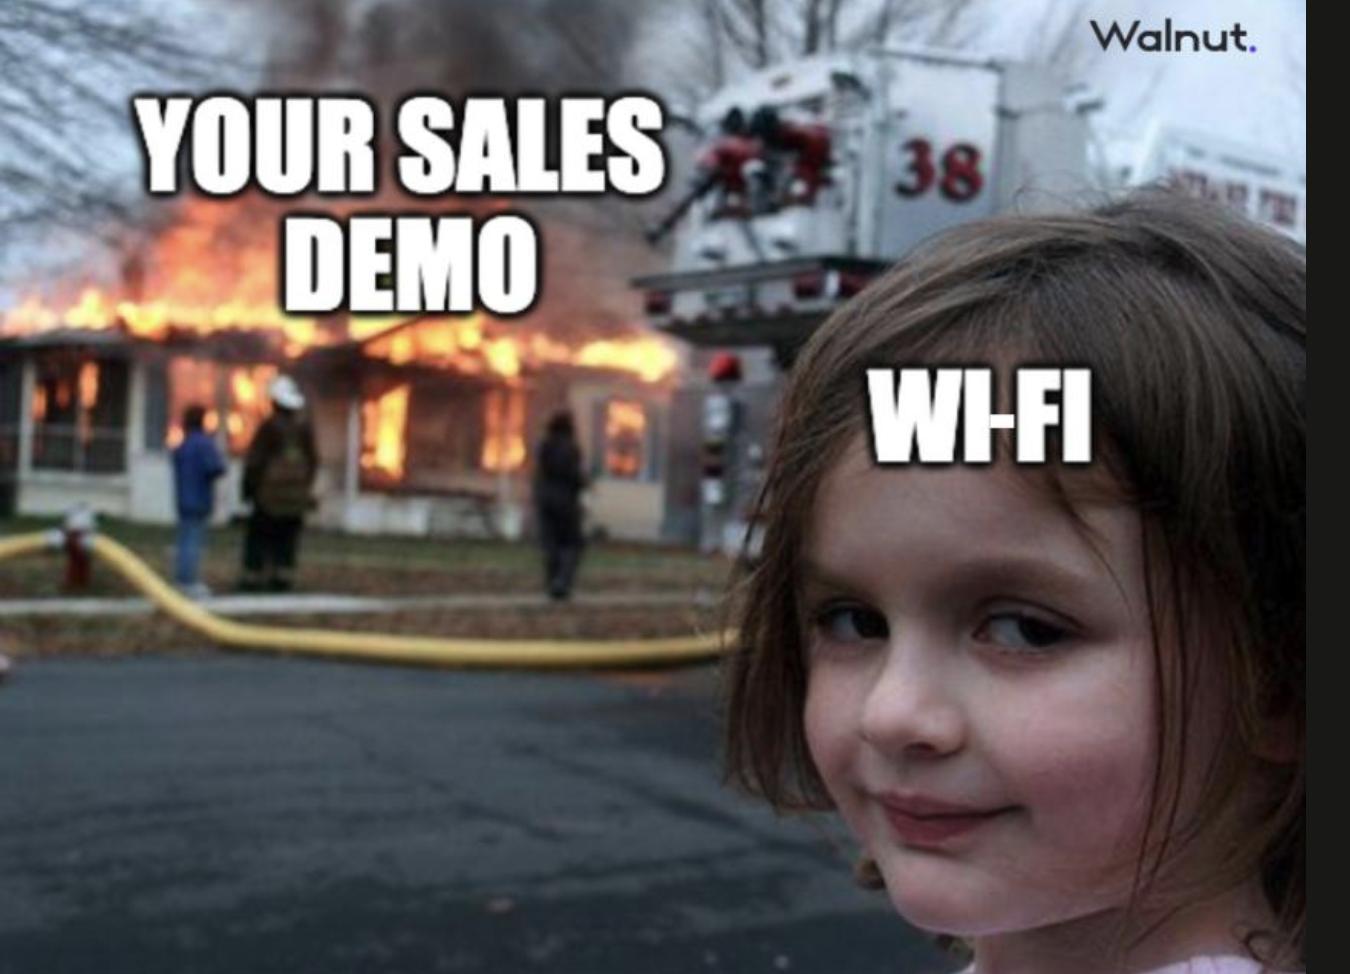 meme sales: demo wi-fi bug